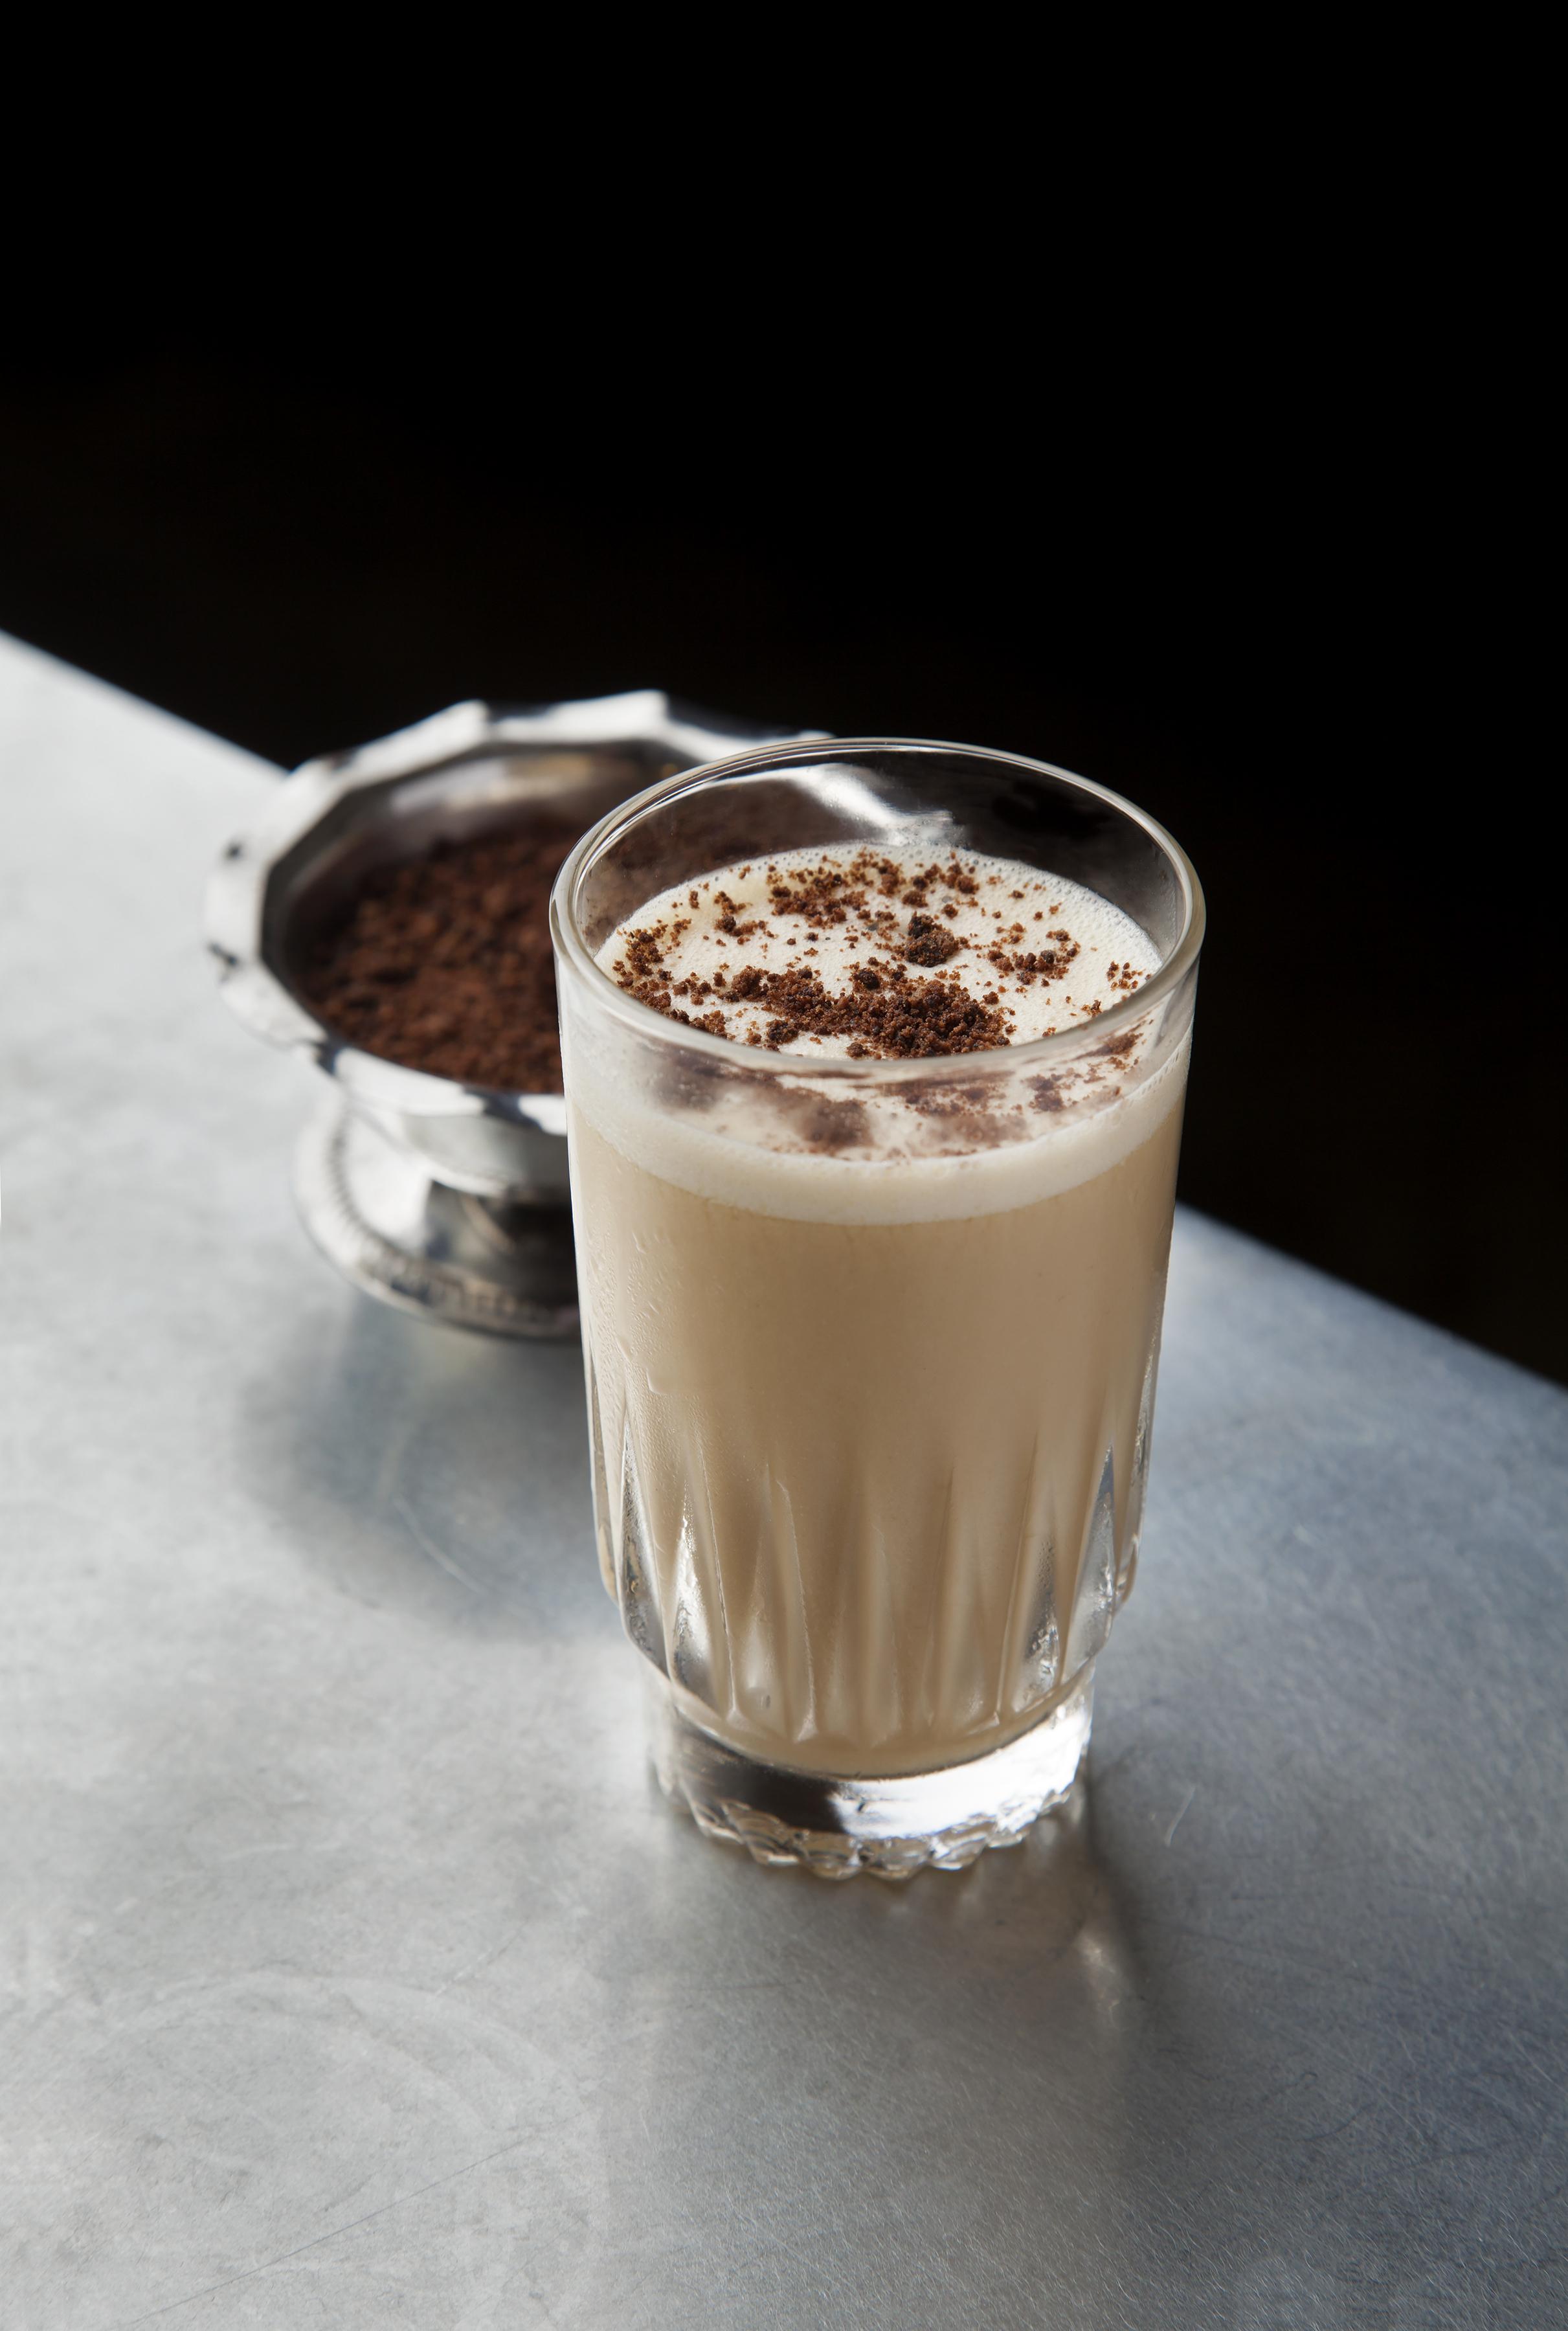 gallery-mace--cocoa-cocktail-crdt-scott gordon bleicher